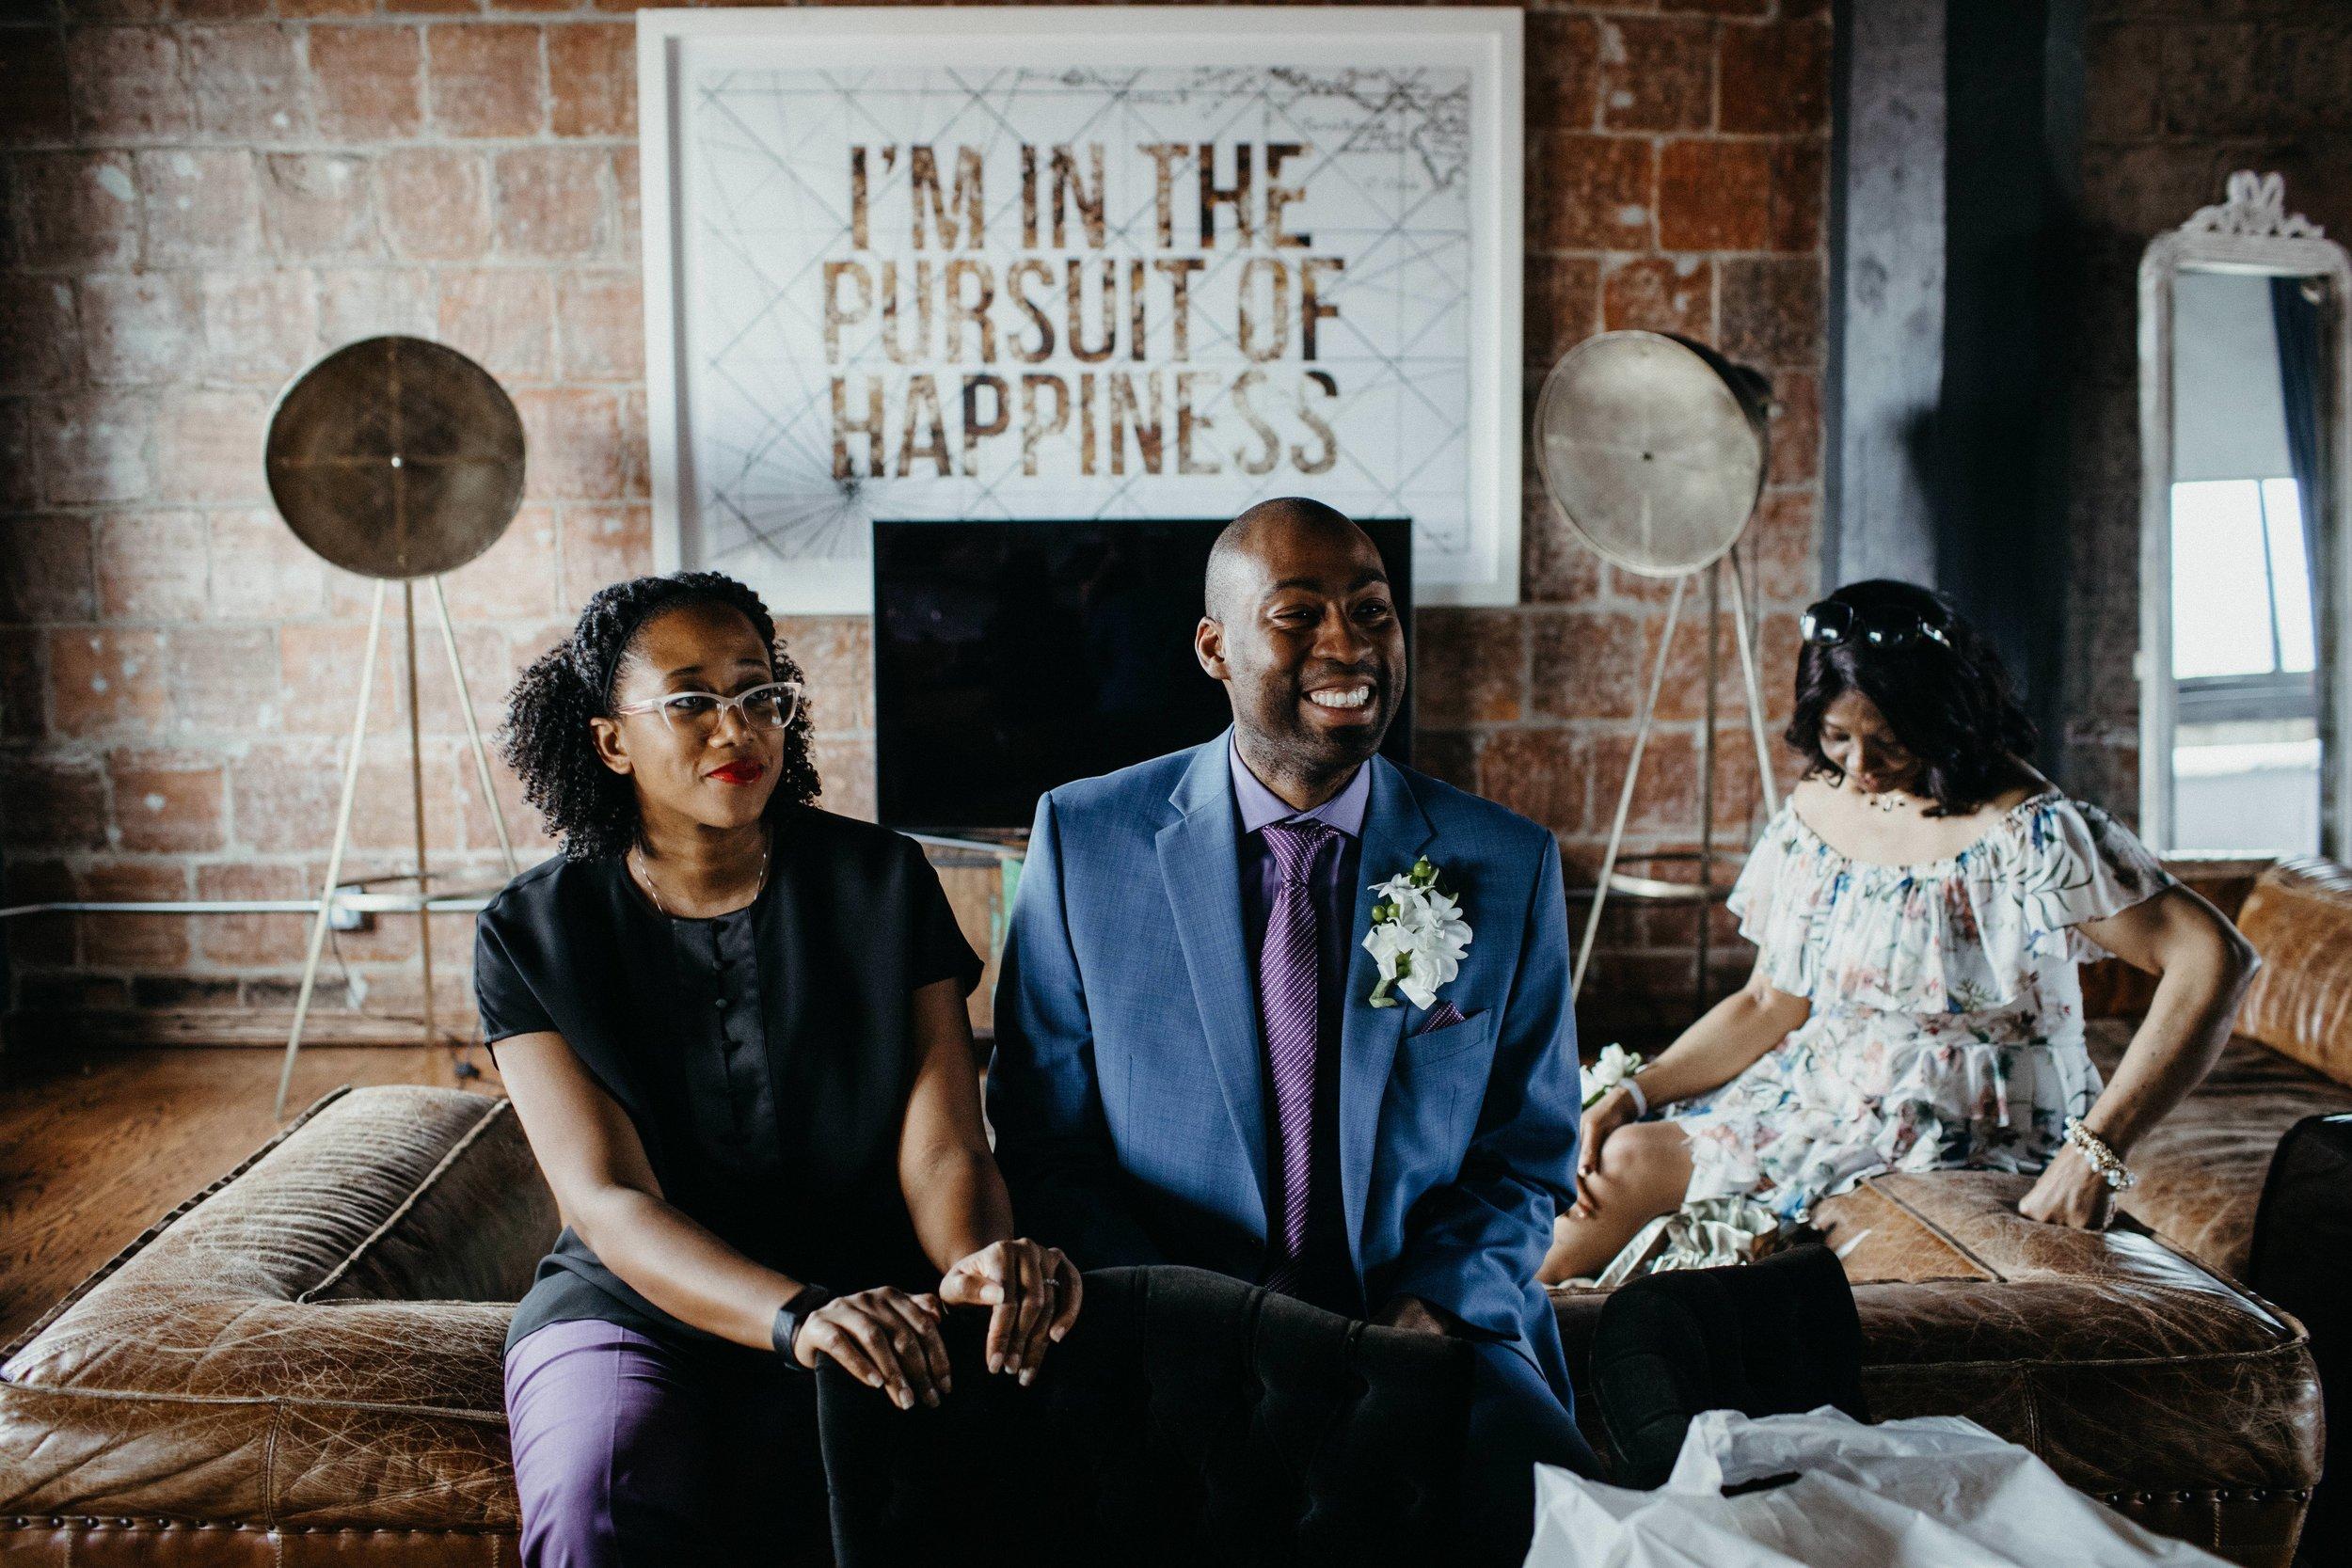 Sevlynn-Photography-Wedding-LIC-Landing-Maiella-NYC-33.jpg